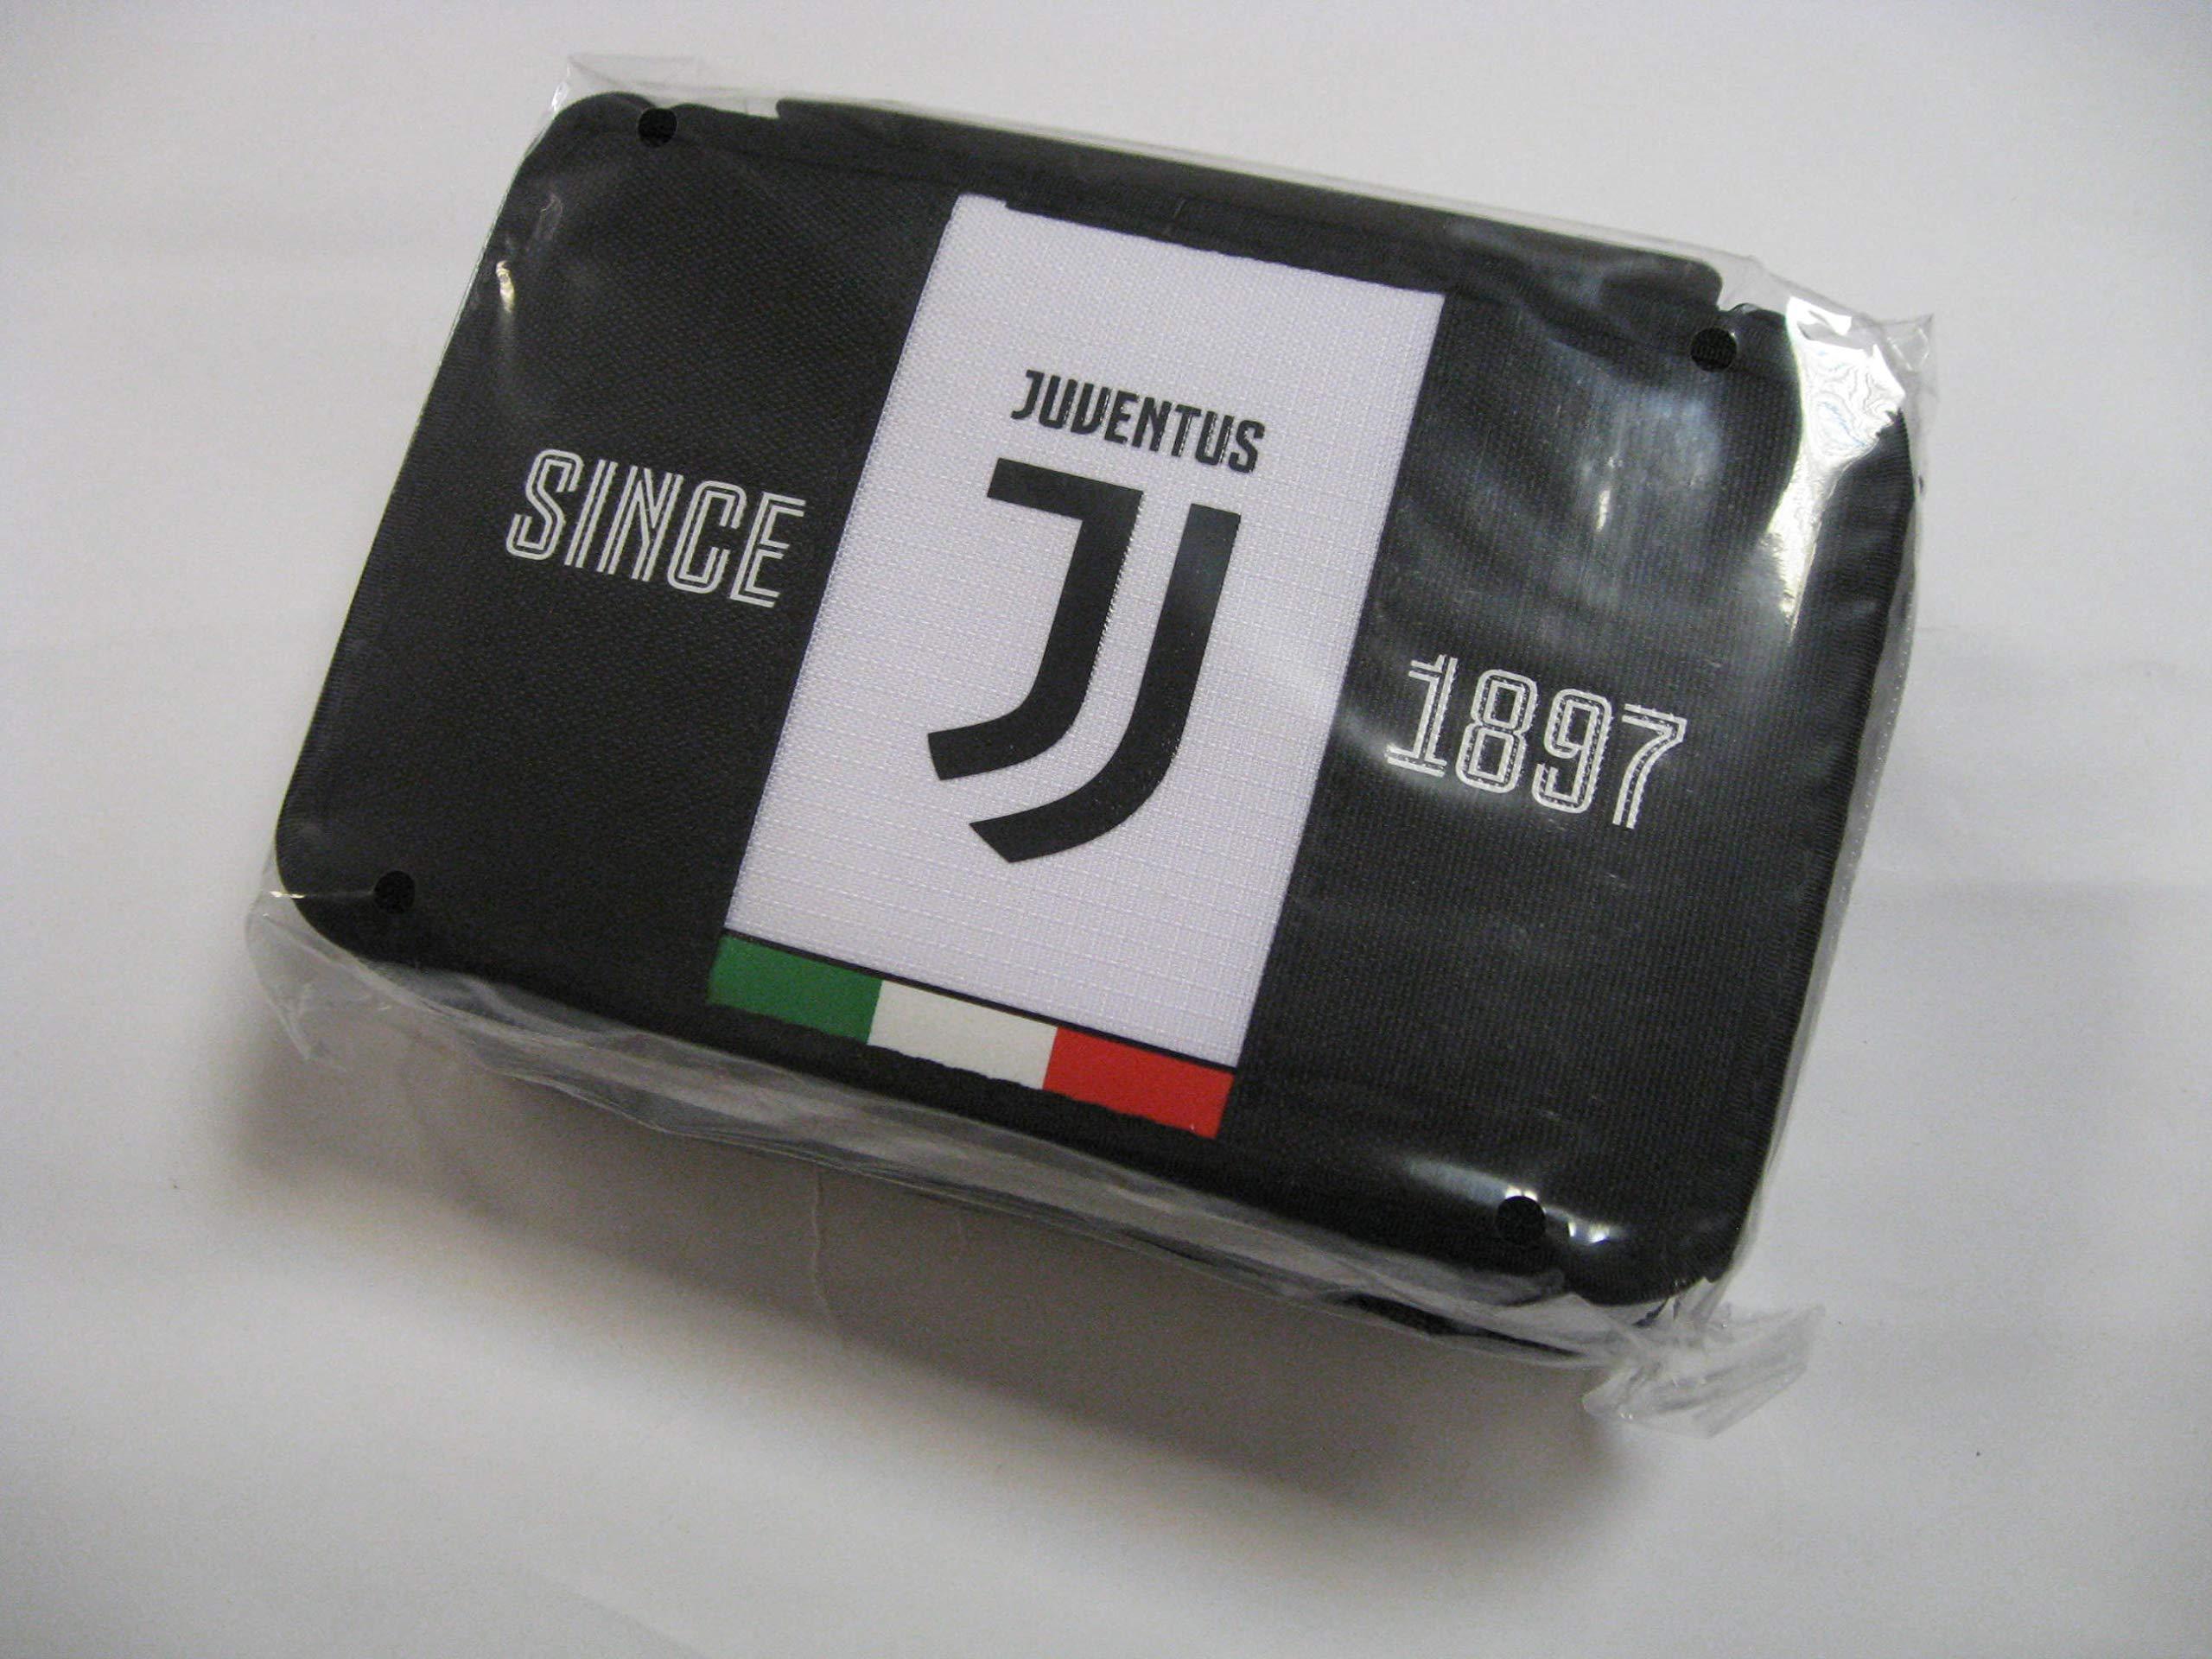 Estuche de 3 cremalleras completo Juventus producto oficial Seven